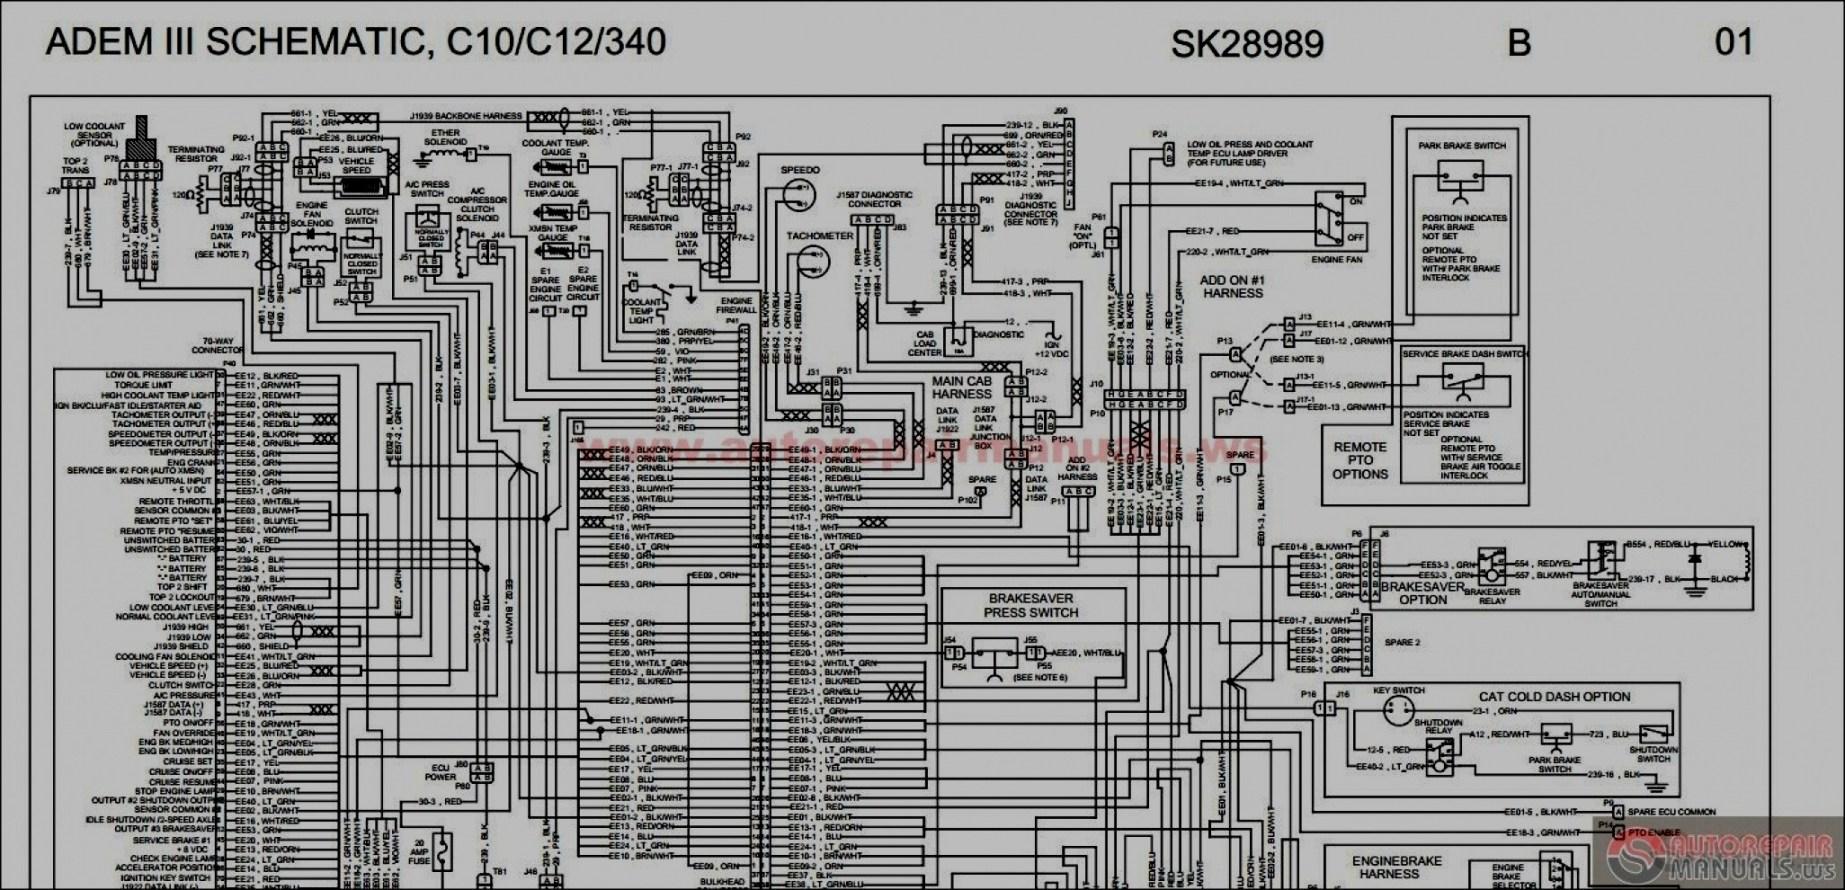 2007 peterbilt 379 wiring diagram c15 caterpillar starter wiring diagram e3 wiring diagram  c15 caterpillar starter wiring diagram